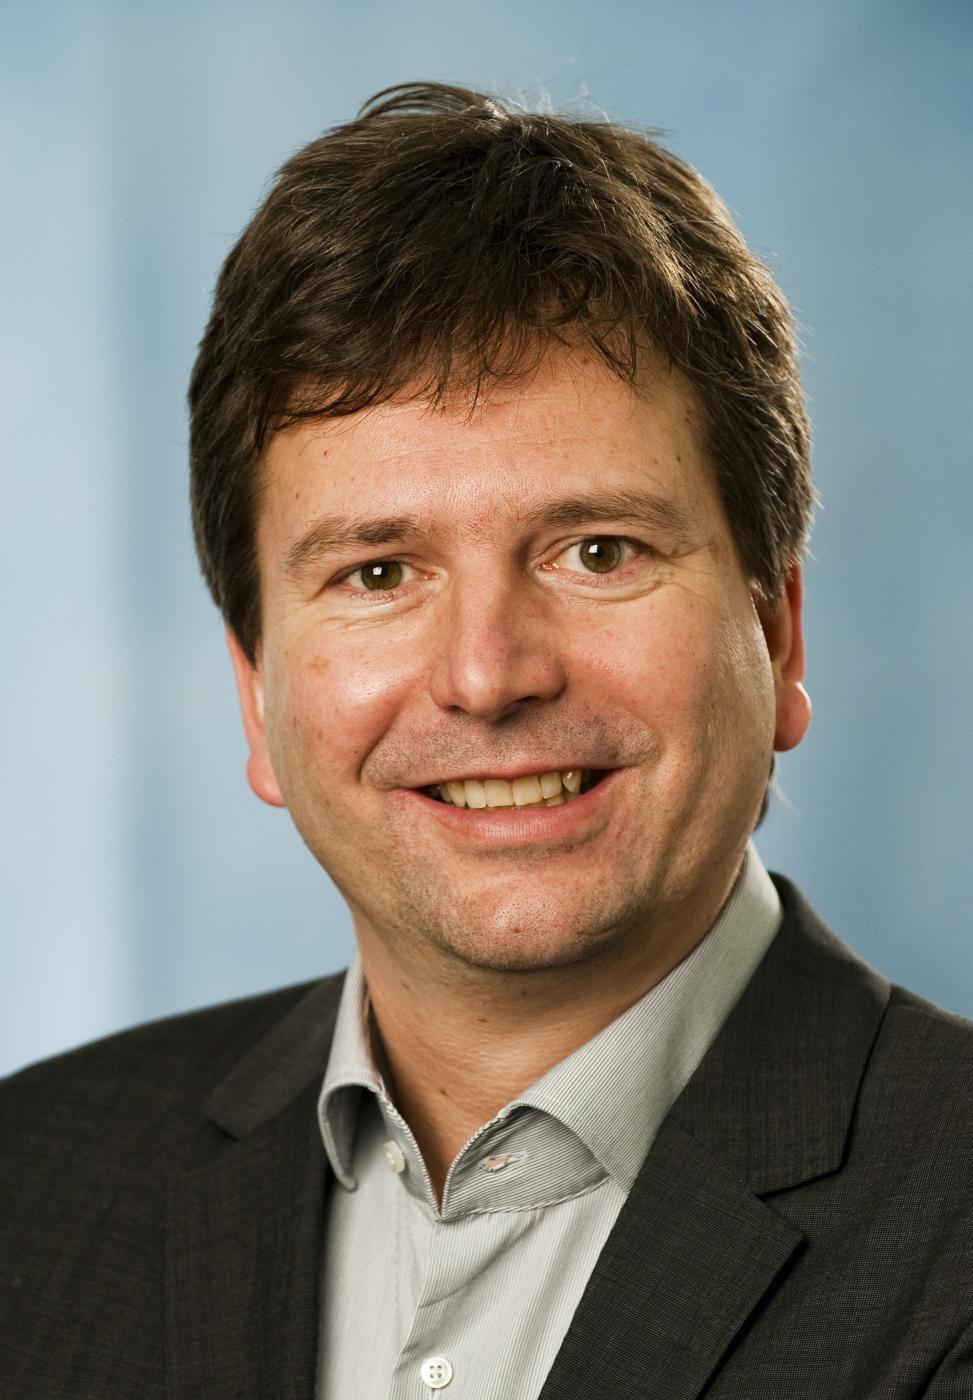 Oliver Bringmann, FZI, DE